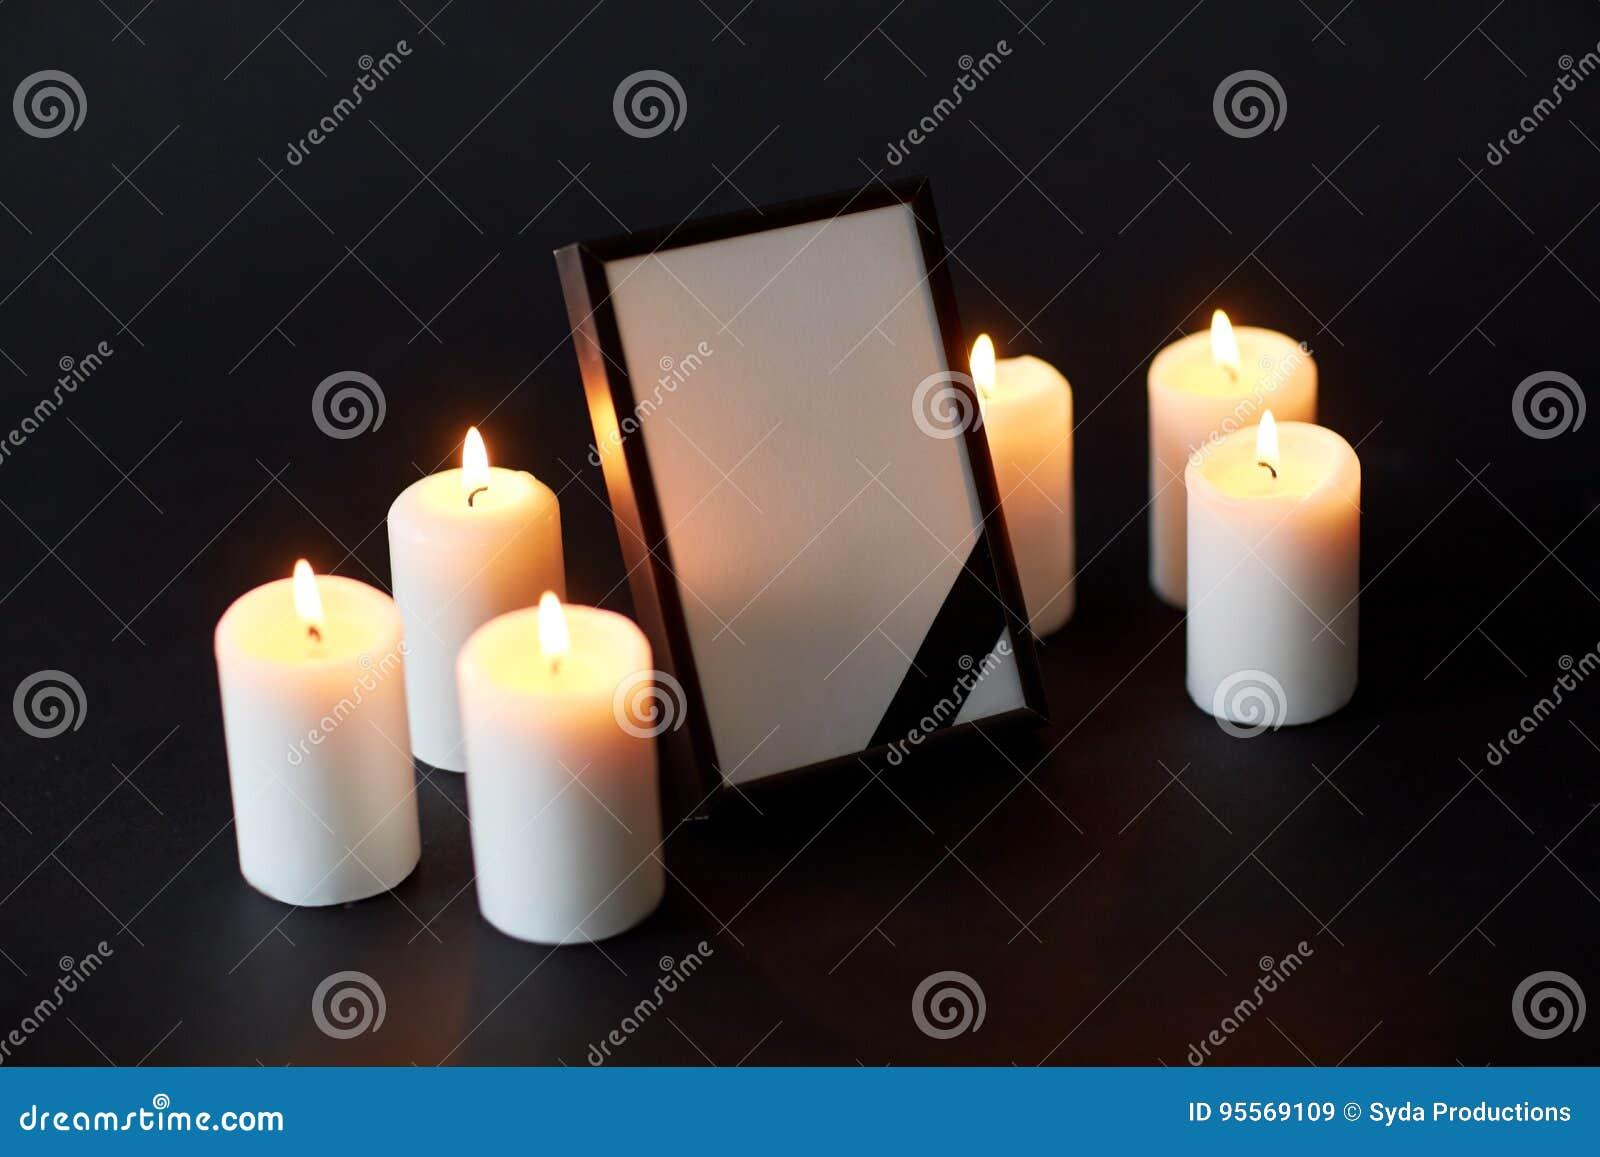 Black ribbon on photo frame and candles at funeral stock image black ribbon on photo frame and candles at funeral izmirmasajfo